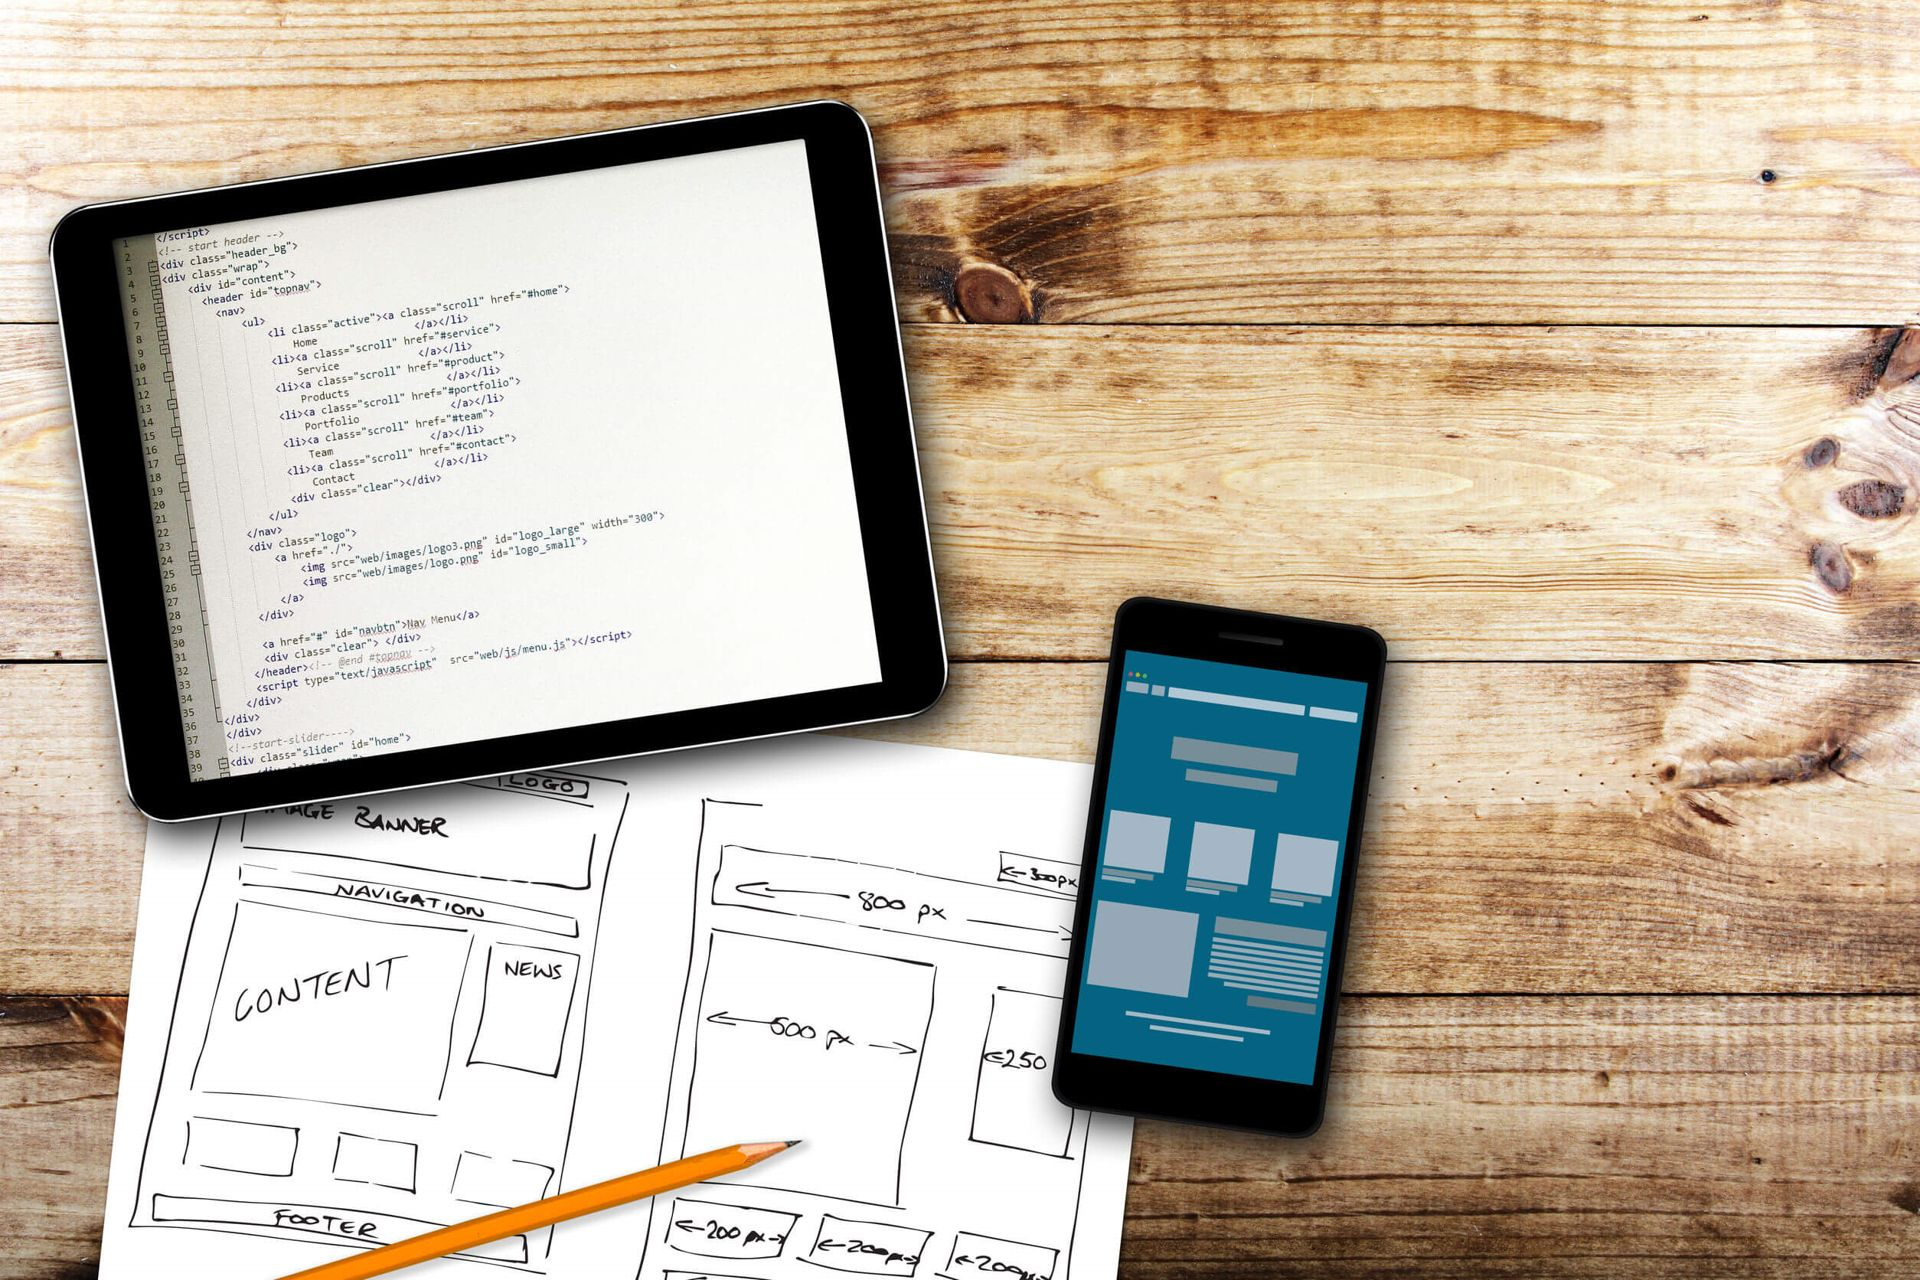 Diseño web responsive es Vilanova i la Geltrú